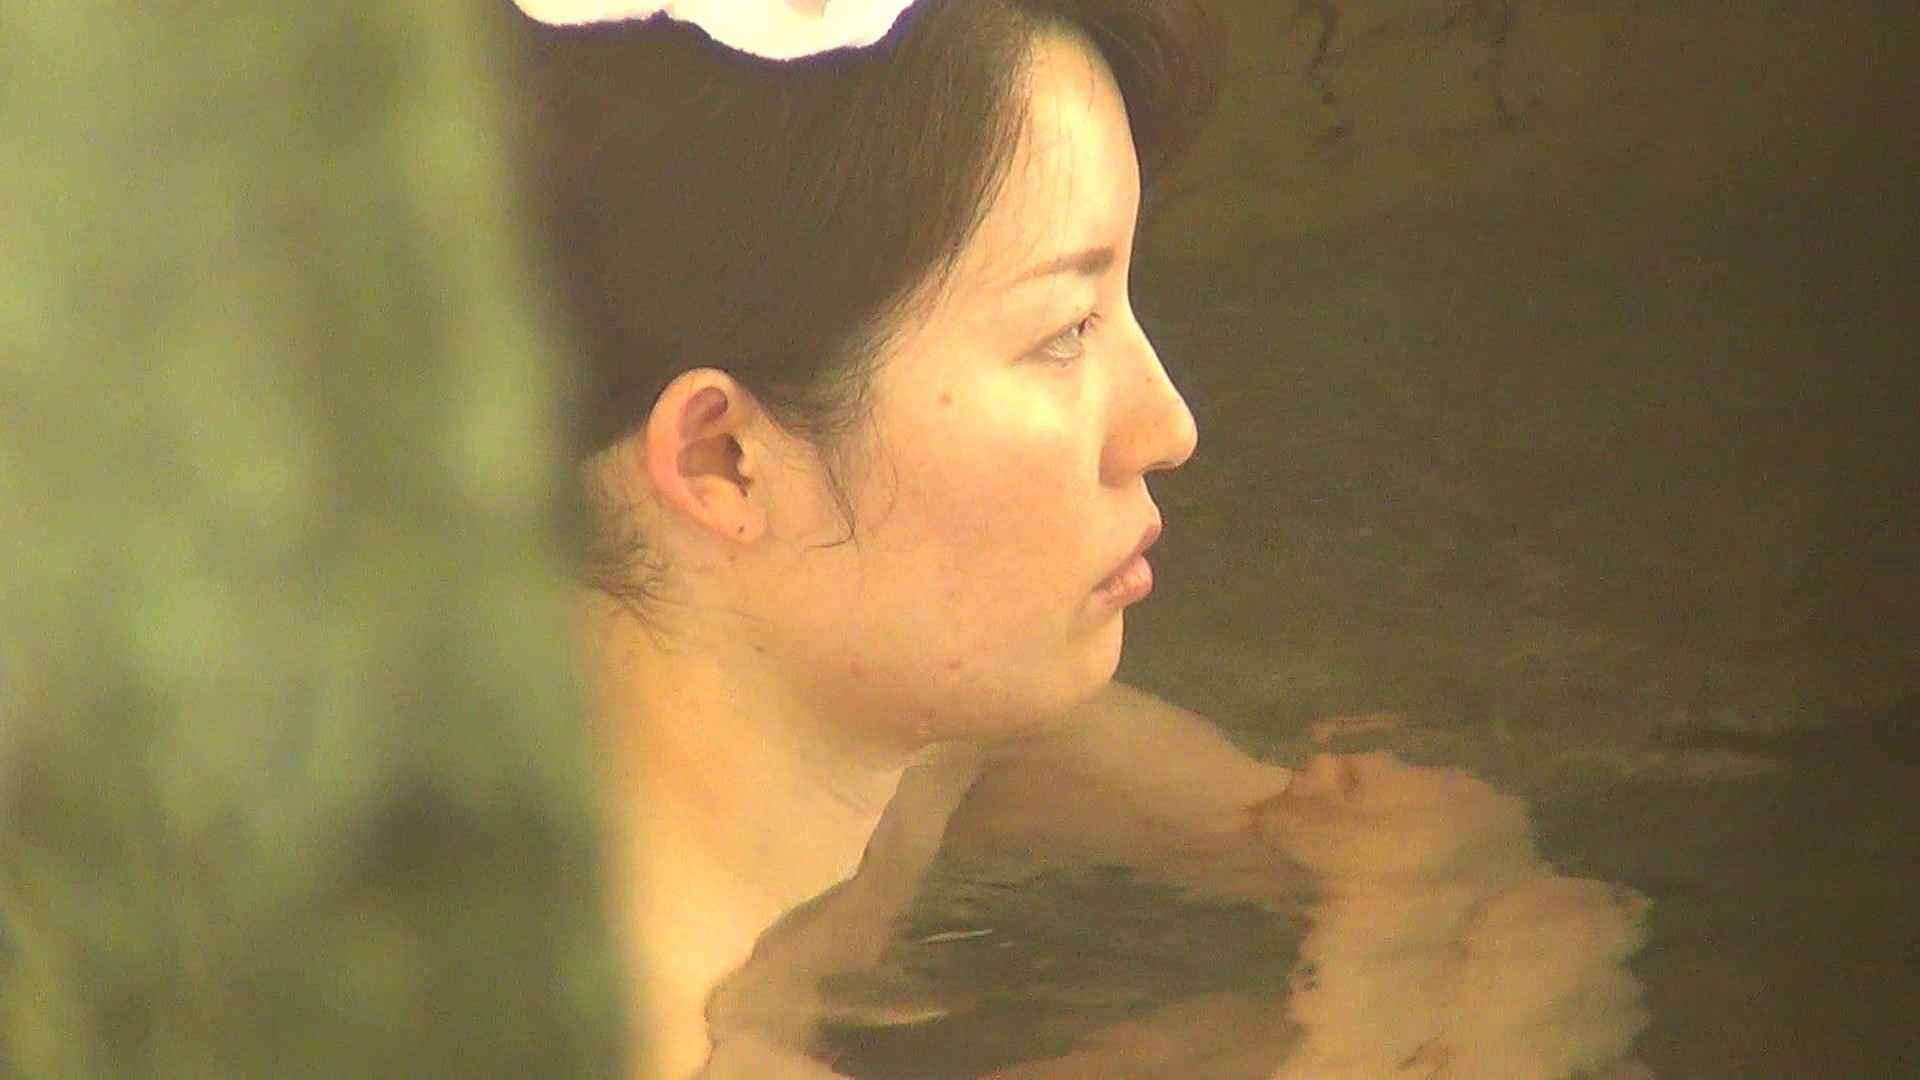 Aquaな露天風呂Vol.301 OLセックス 隠し撮りすけべAV動画紹介 85画像 74